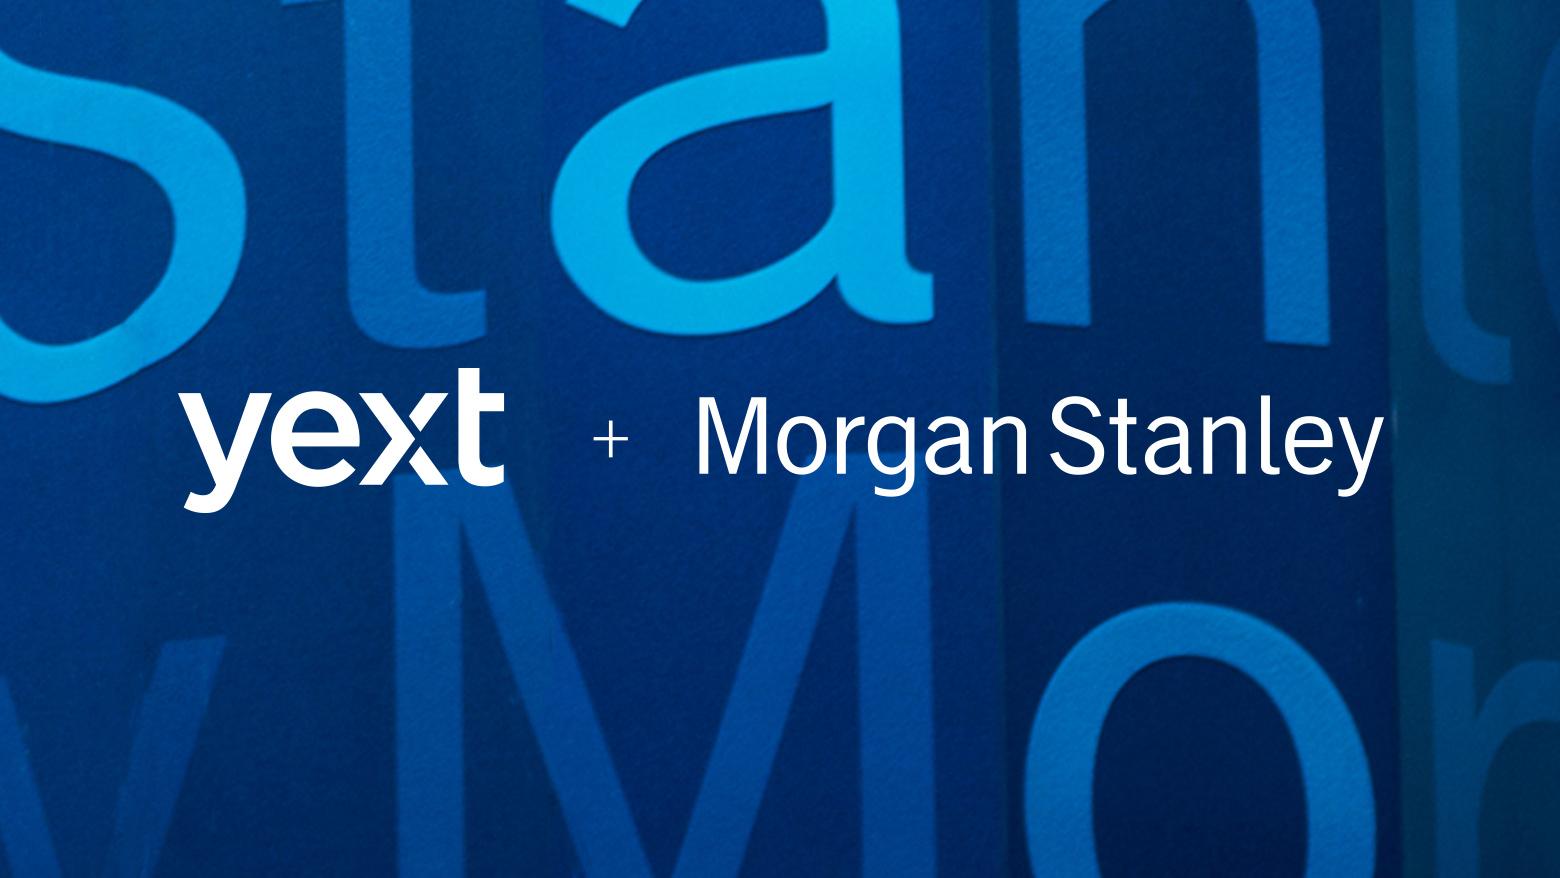 yext.com - Morgan Stanley Chooses Yext Brain to Manage Financial Advisors' Digital Knowledge